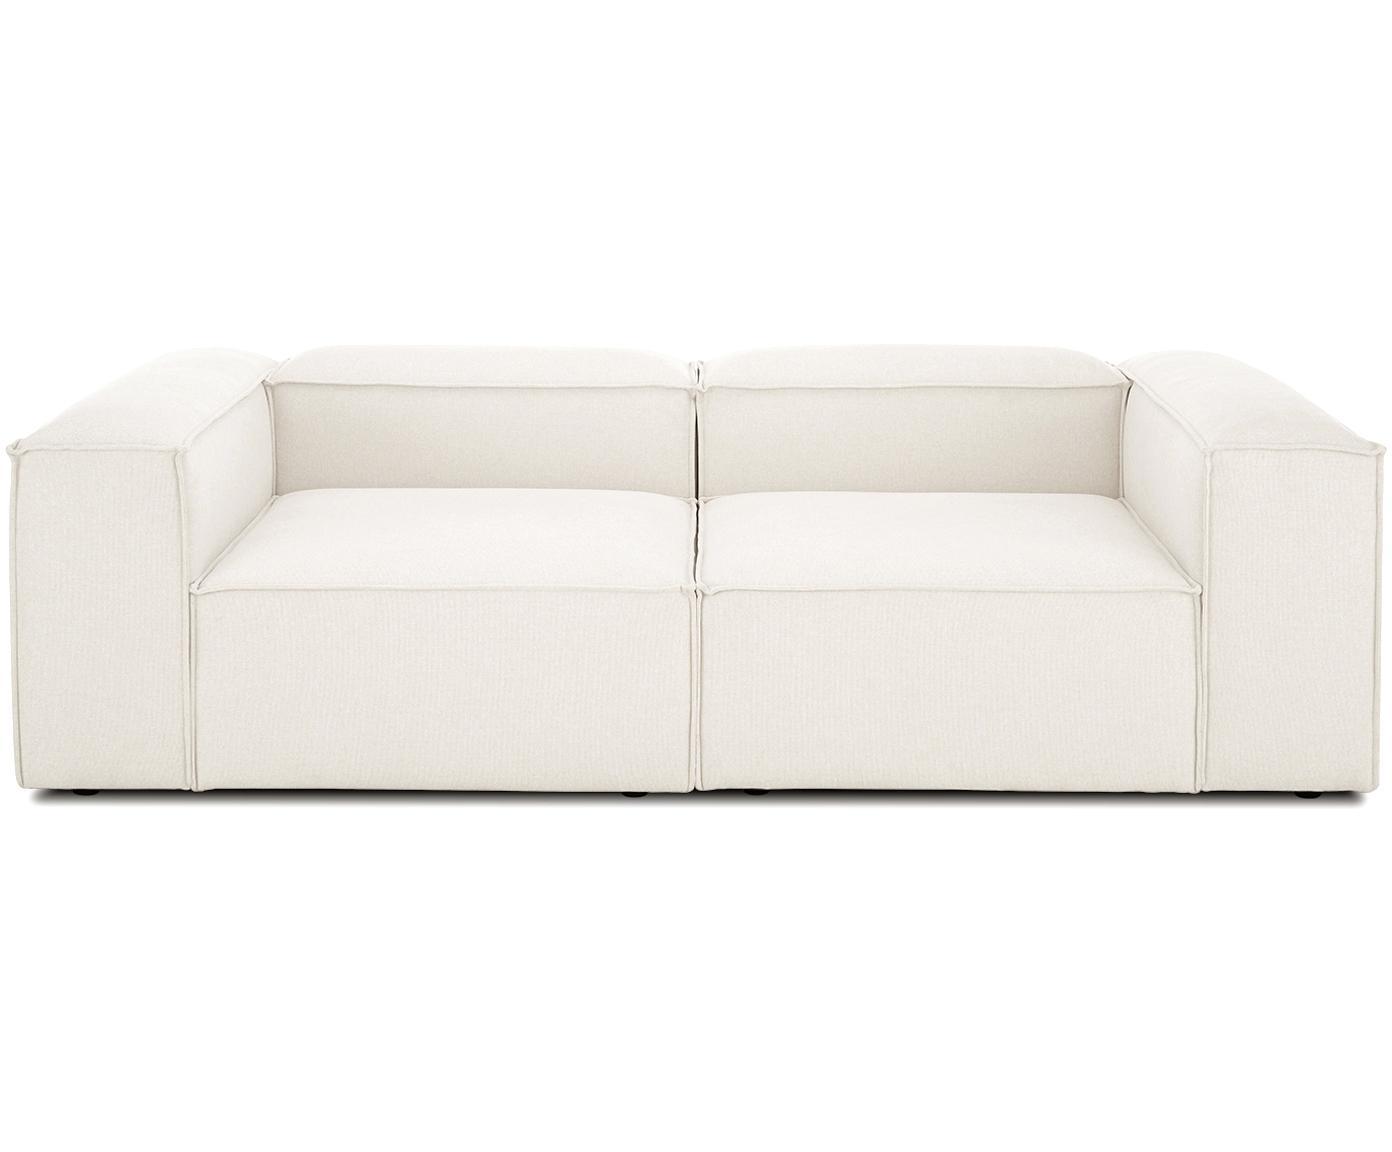 Modulares Sofa Lennon (3-Sitzer), Bezug: Polyester 35.000 Scheuert, Gestell: Massives Kiefernholz, Spe, Webstoff Beige, B 238 x T 119 cm